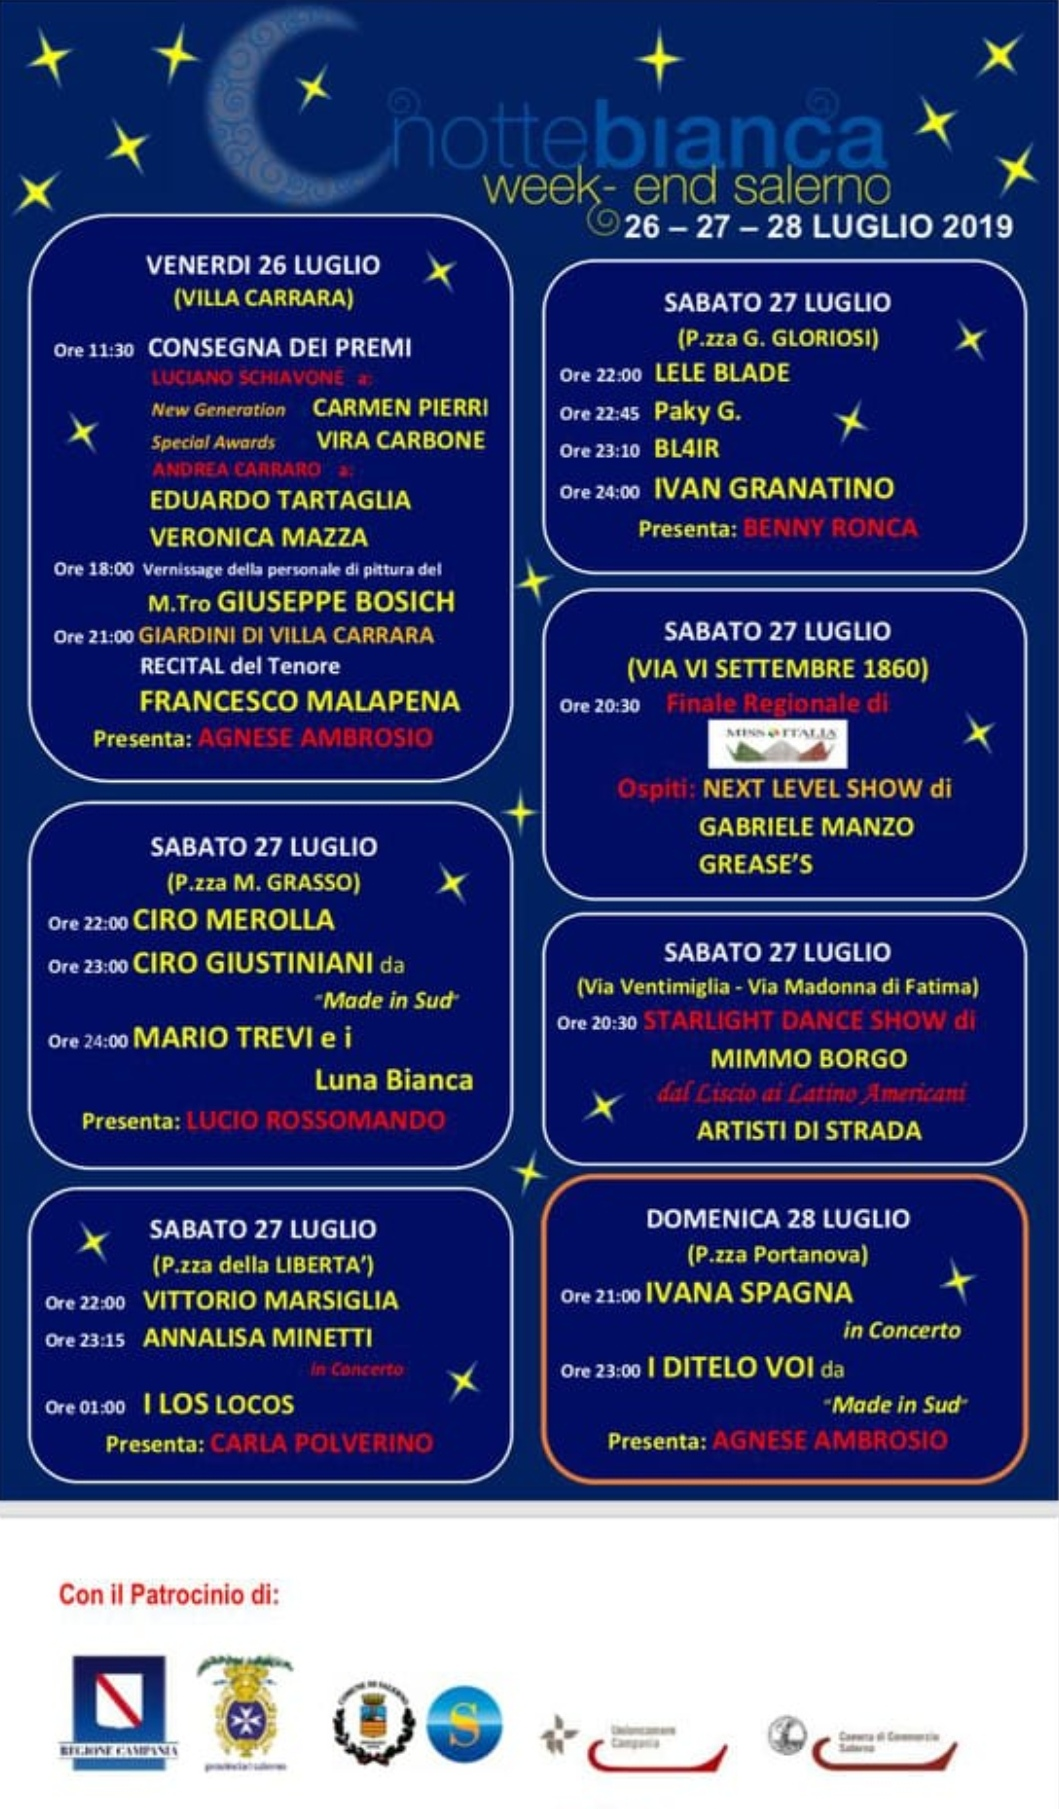 Notte bianca 2019 Salerno